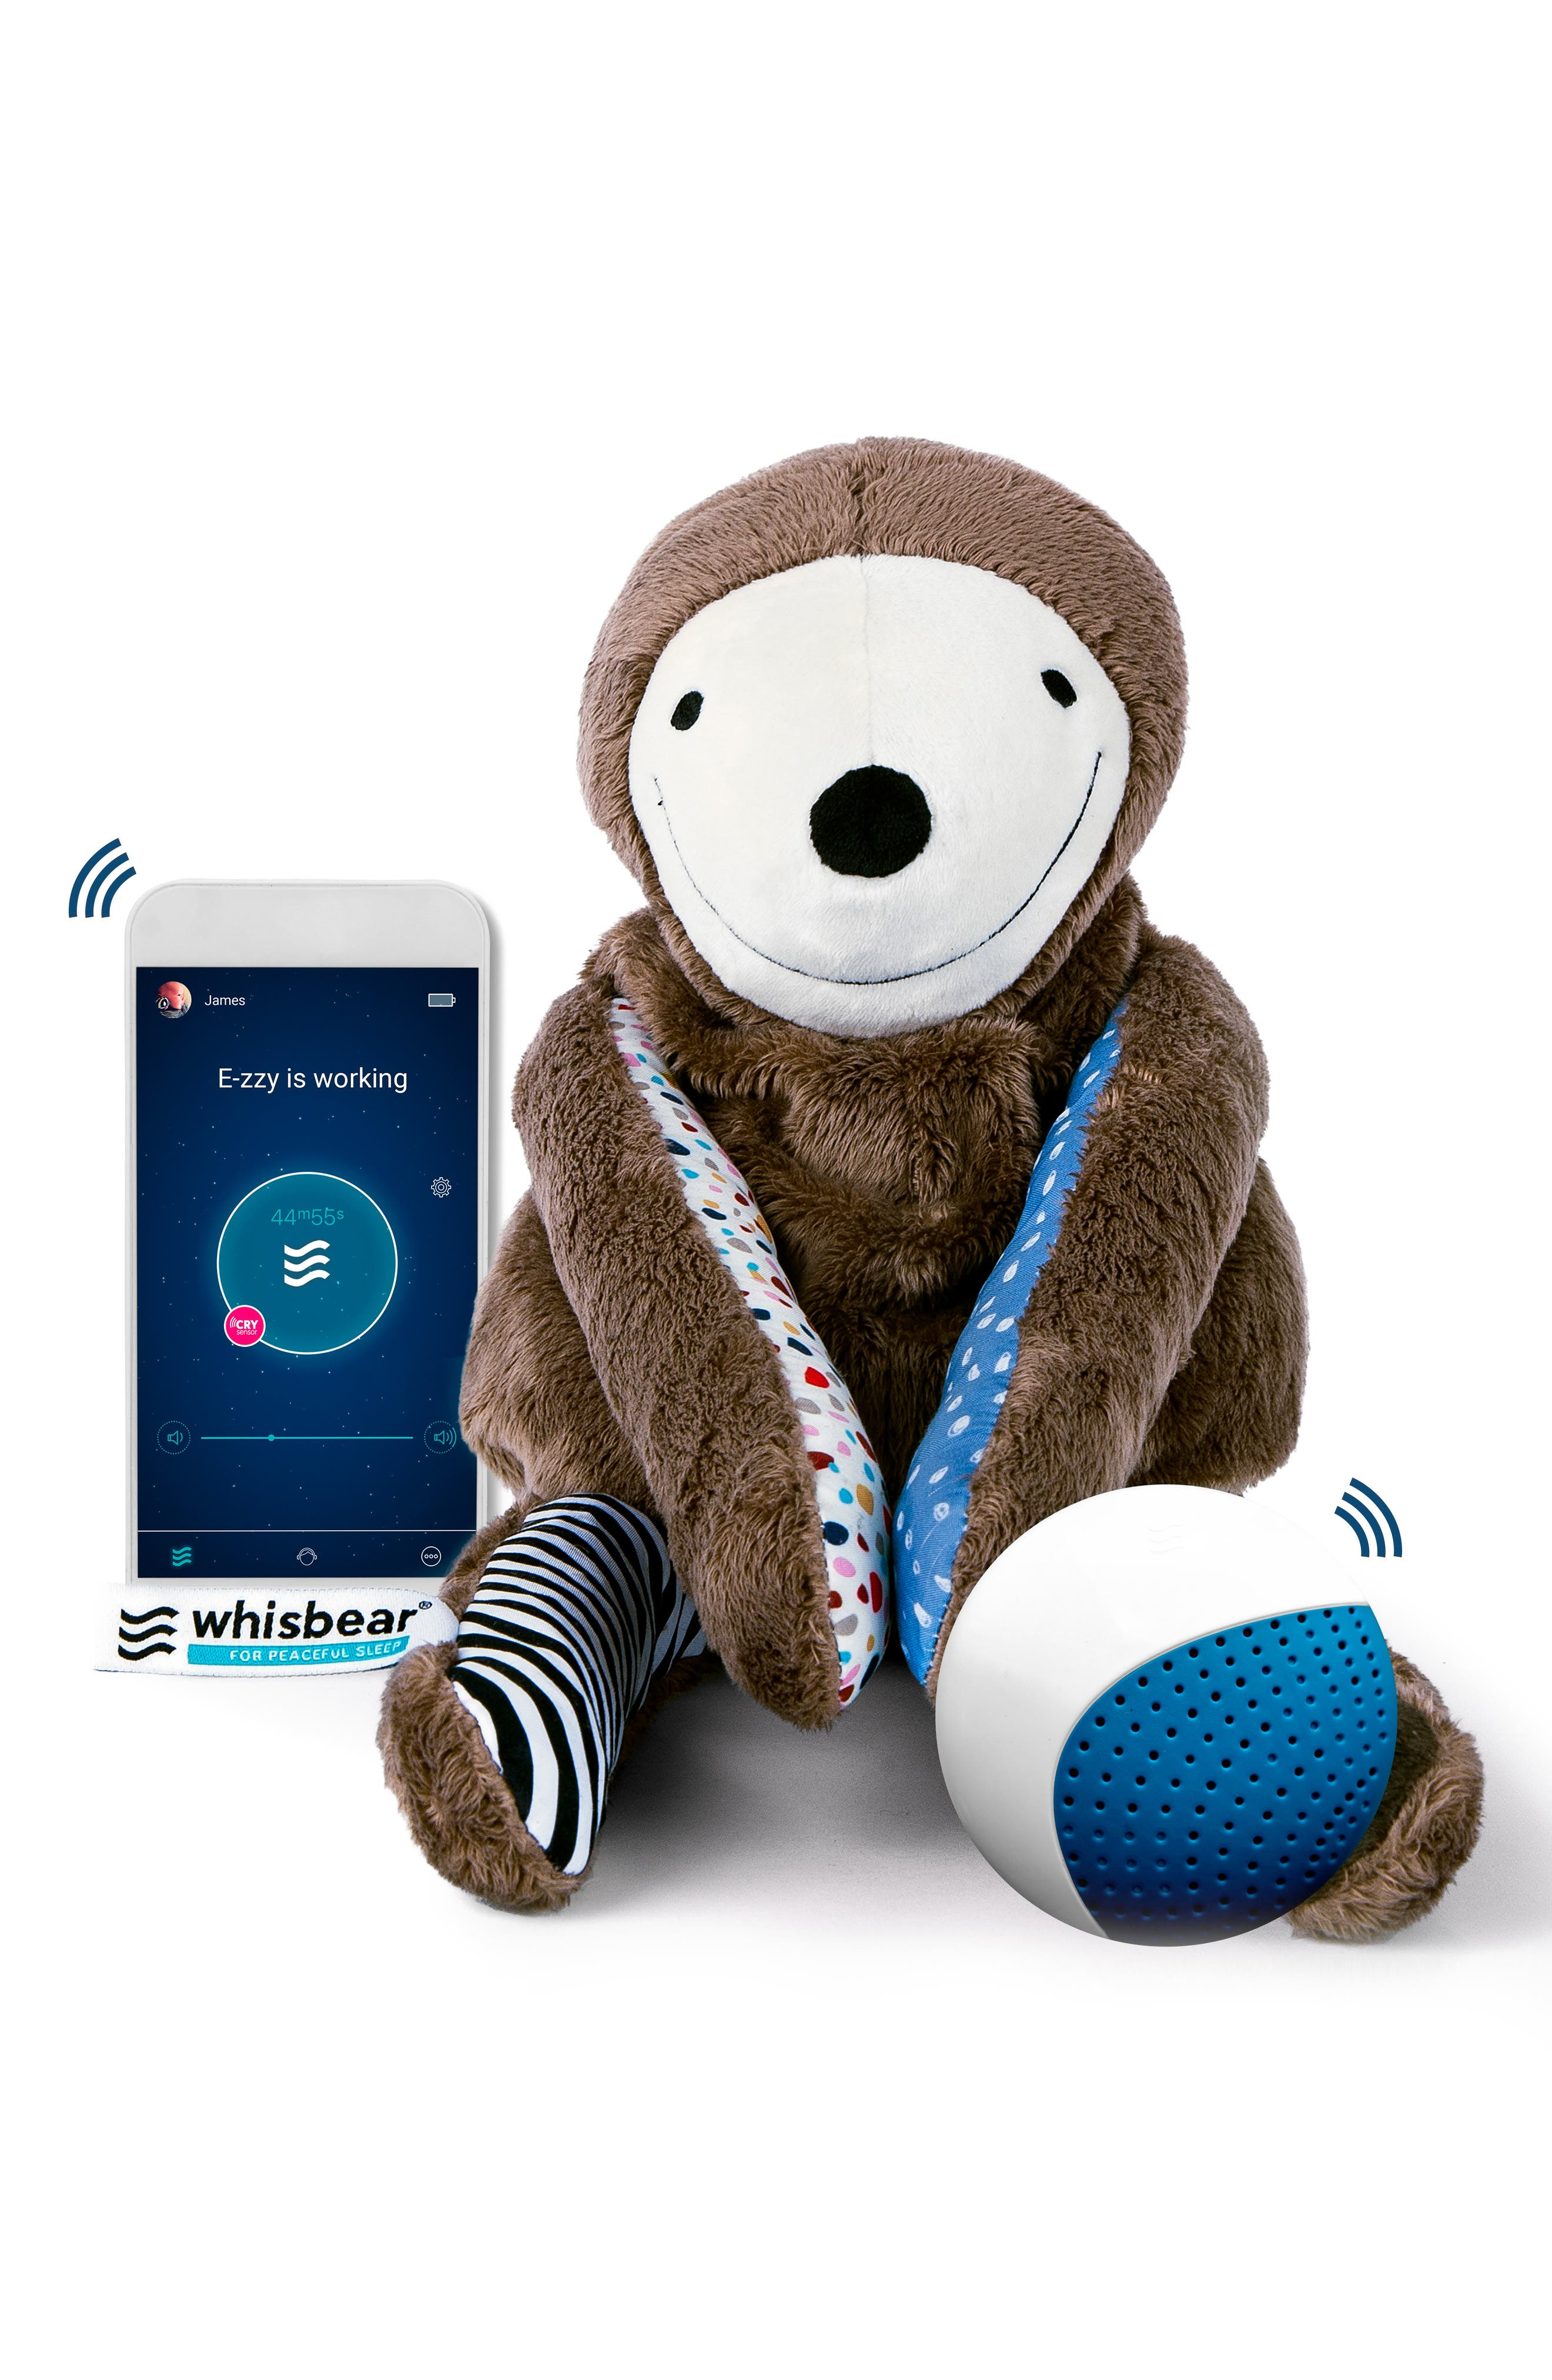 ,                             E-zzy the Sloth Baby Sleep Machine,                             Main thumbnail 1, color,                             200